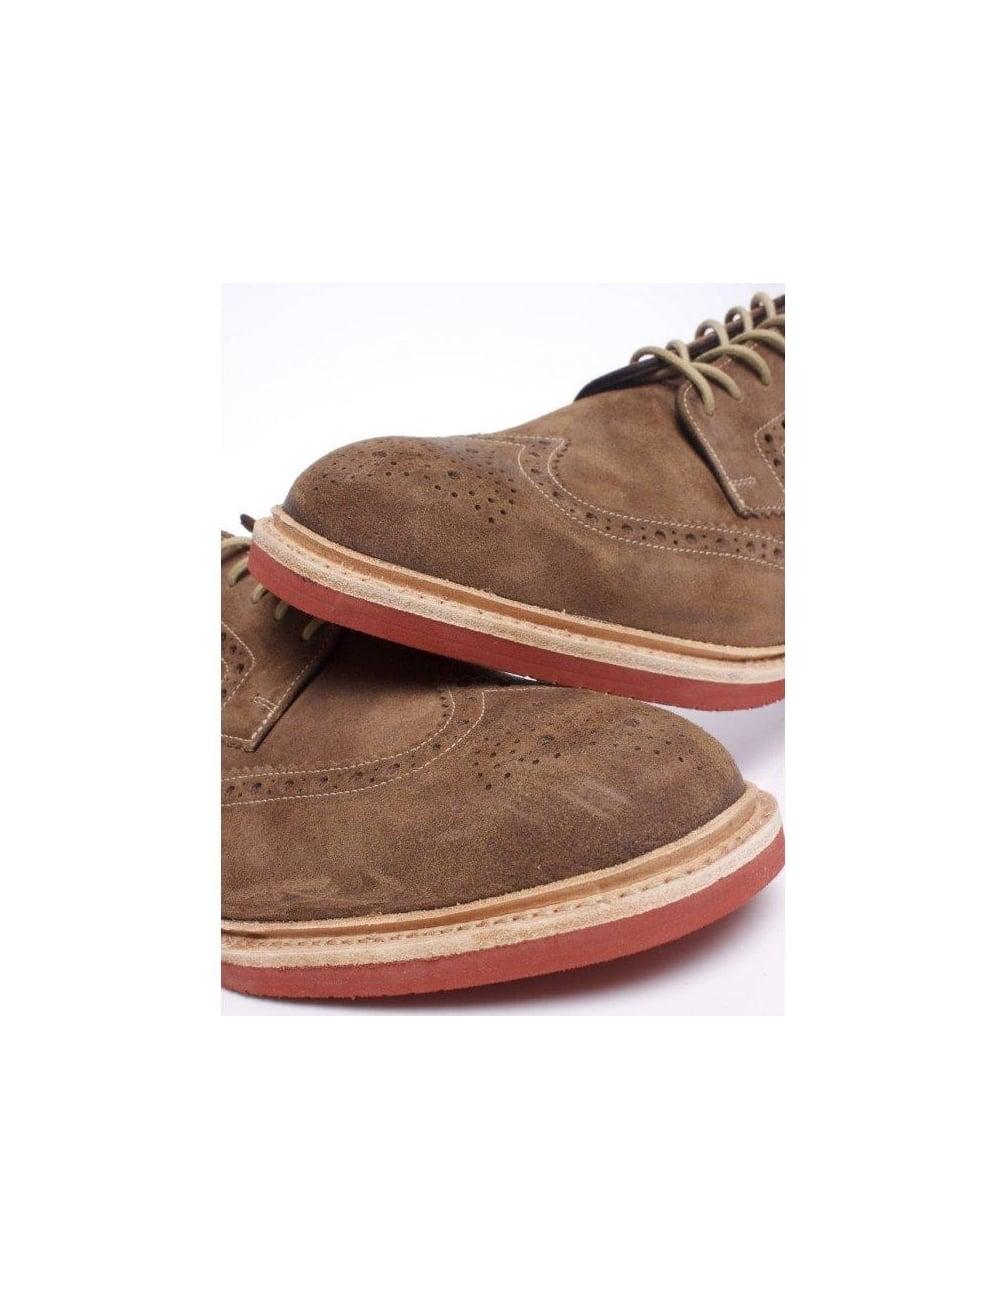 home footwear shoes boots loake loake logan brown. Black Bedroom Furniture Sets. Home Design Ideas